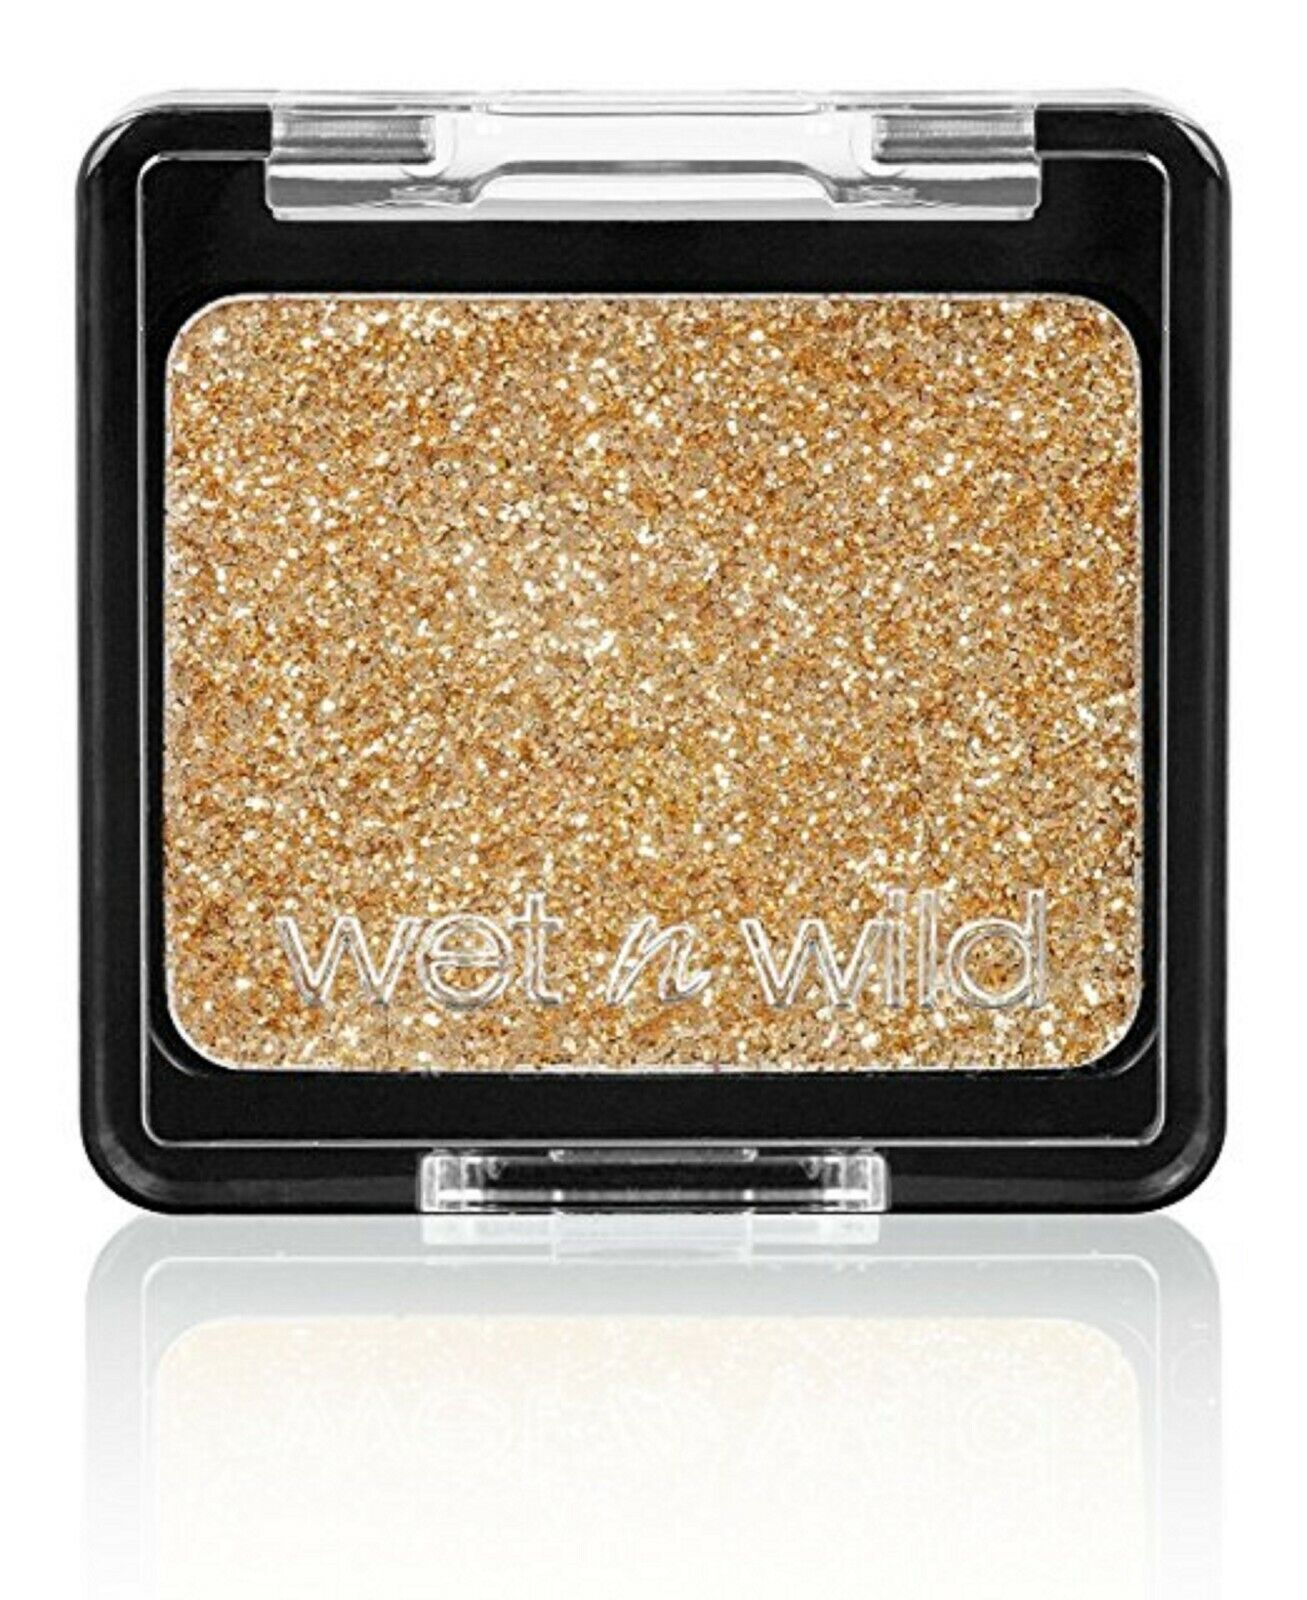 Wet n Wild Color Icon Glitter Single, Brass 354C, 0.06 oz